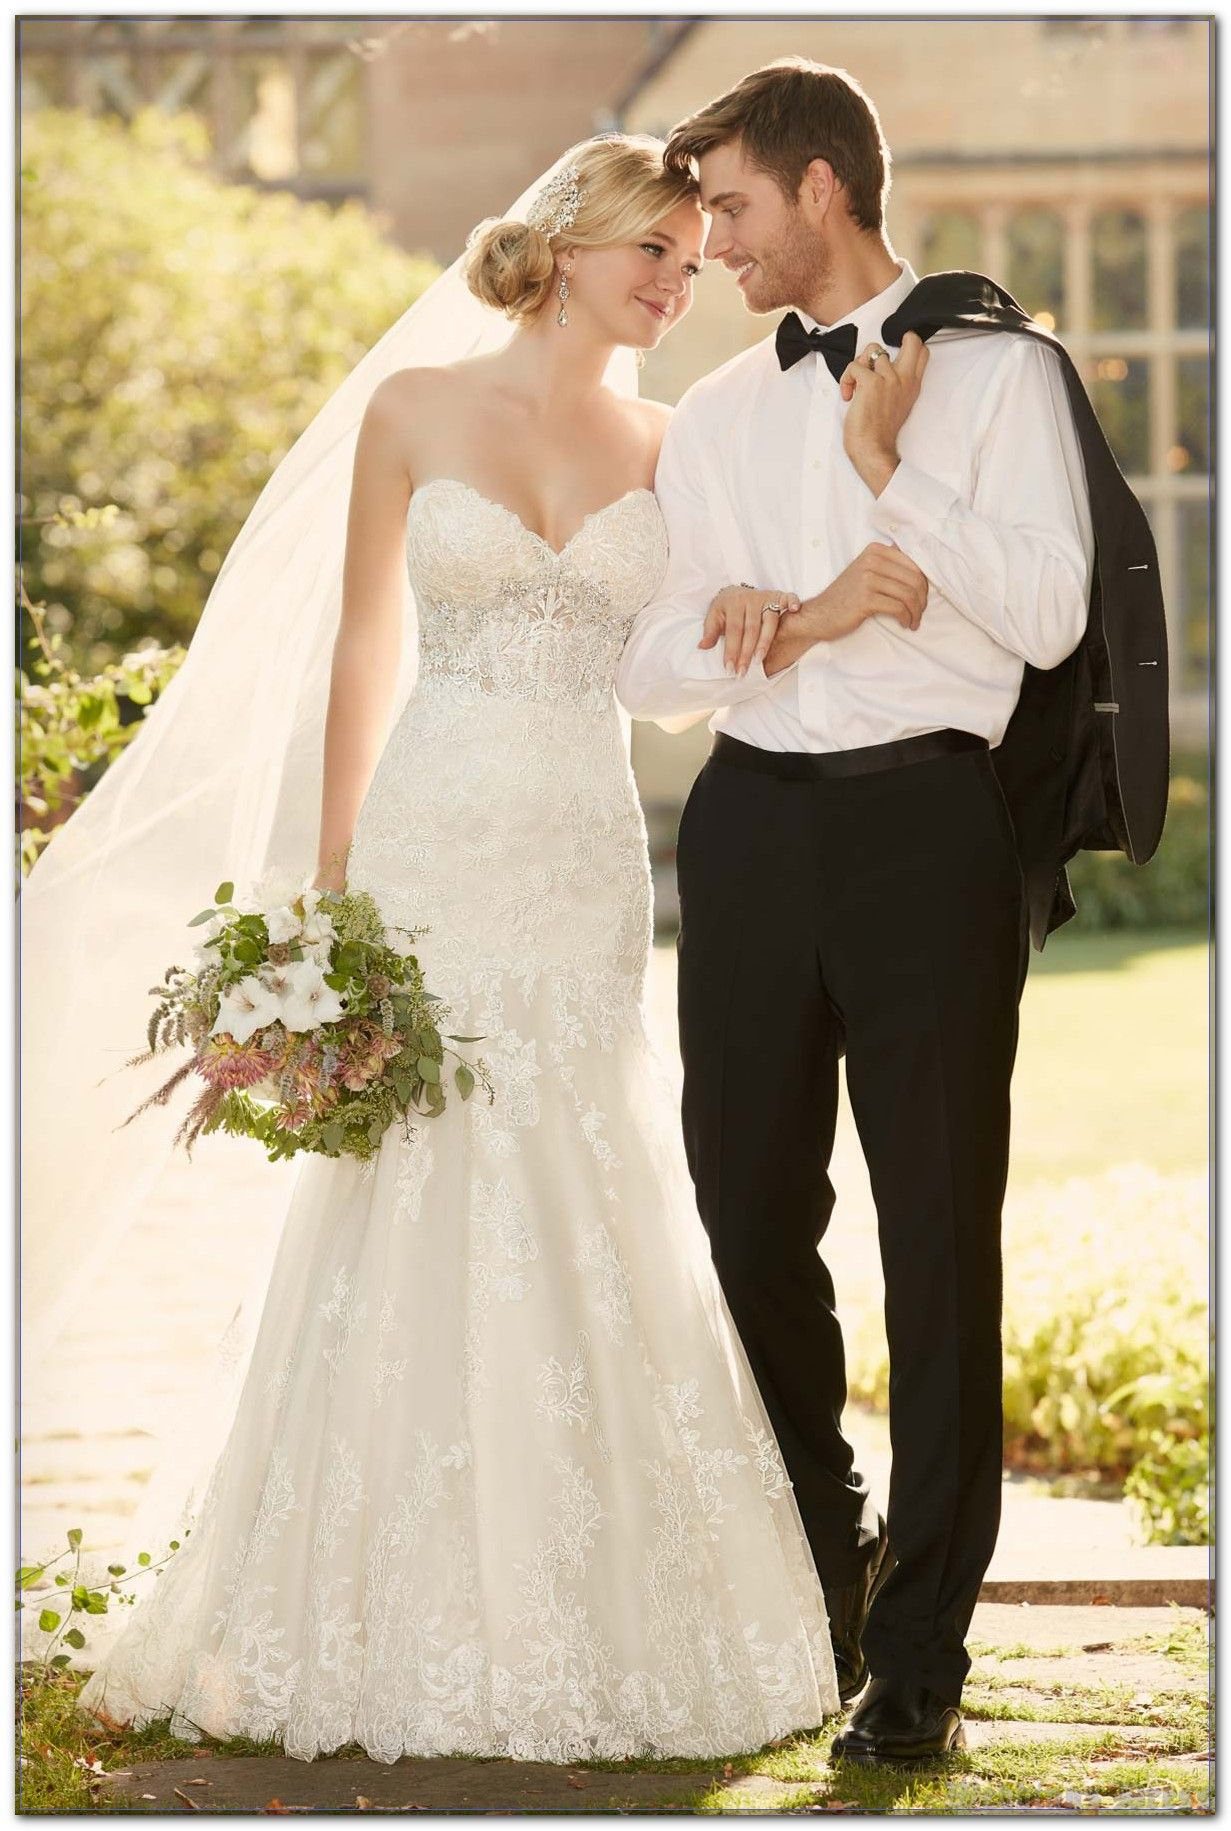 Weddings Dress Your Way To Success